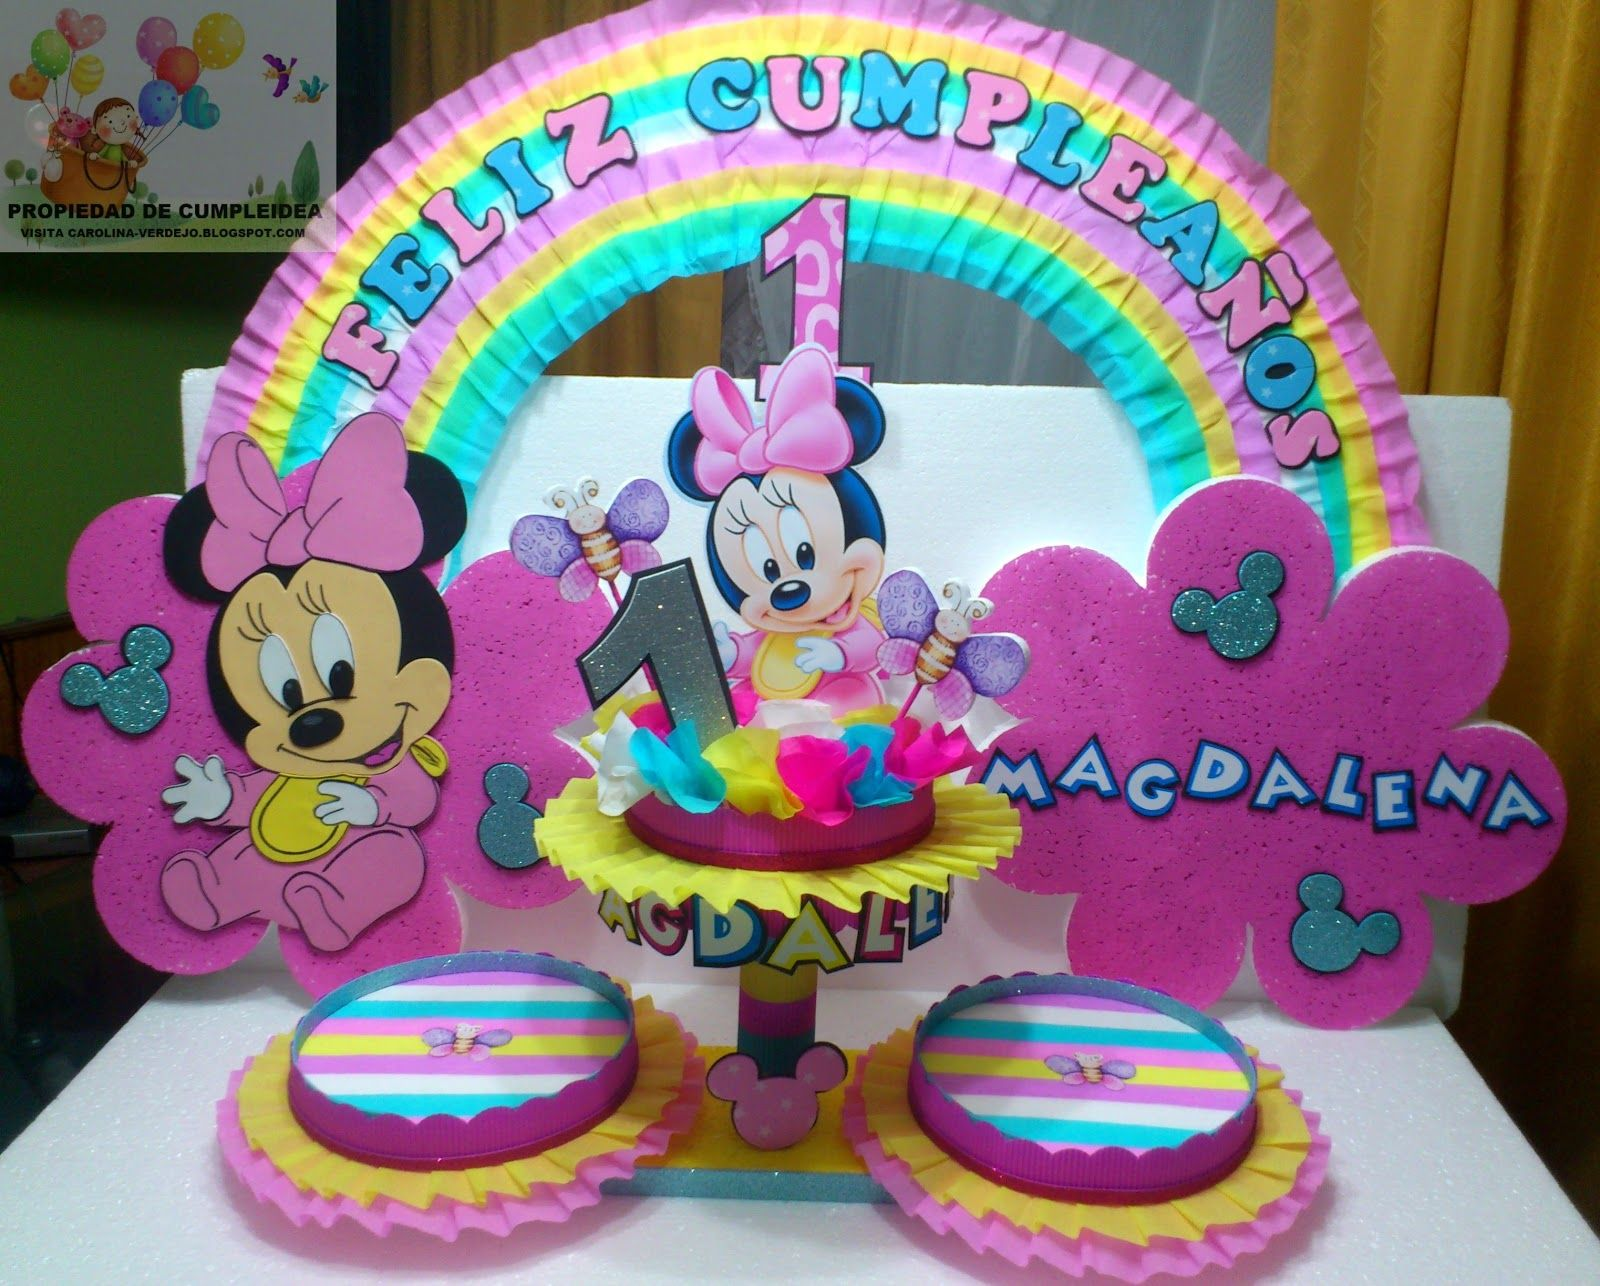 Decoraciones infantiles decoraciones infantiles party - Decoraciones para cumpleanos infantiles ...